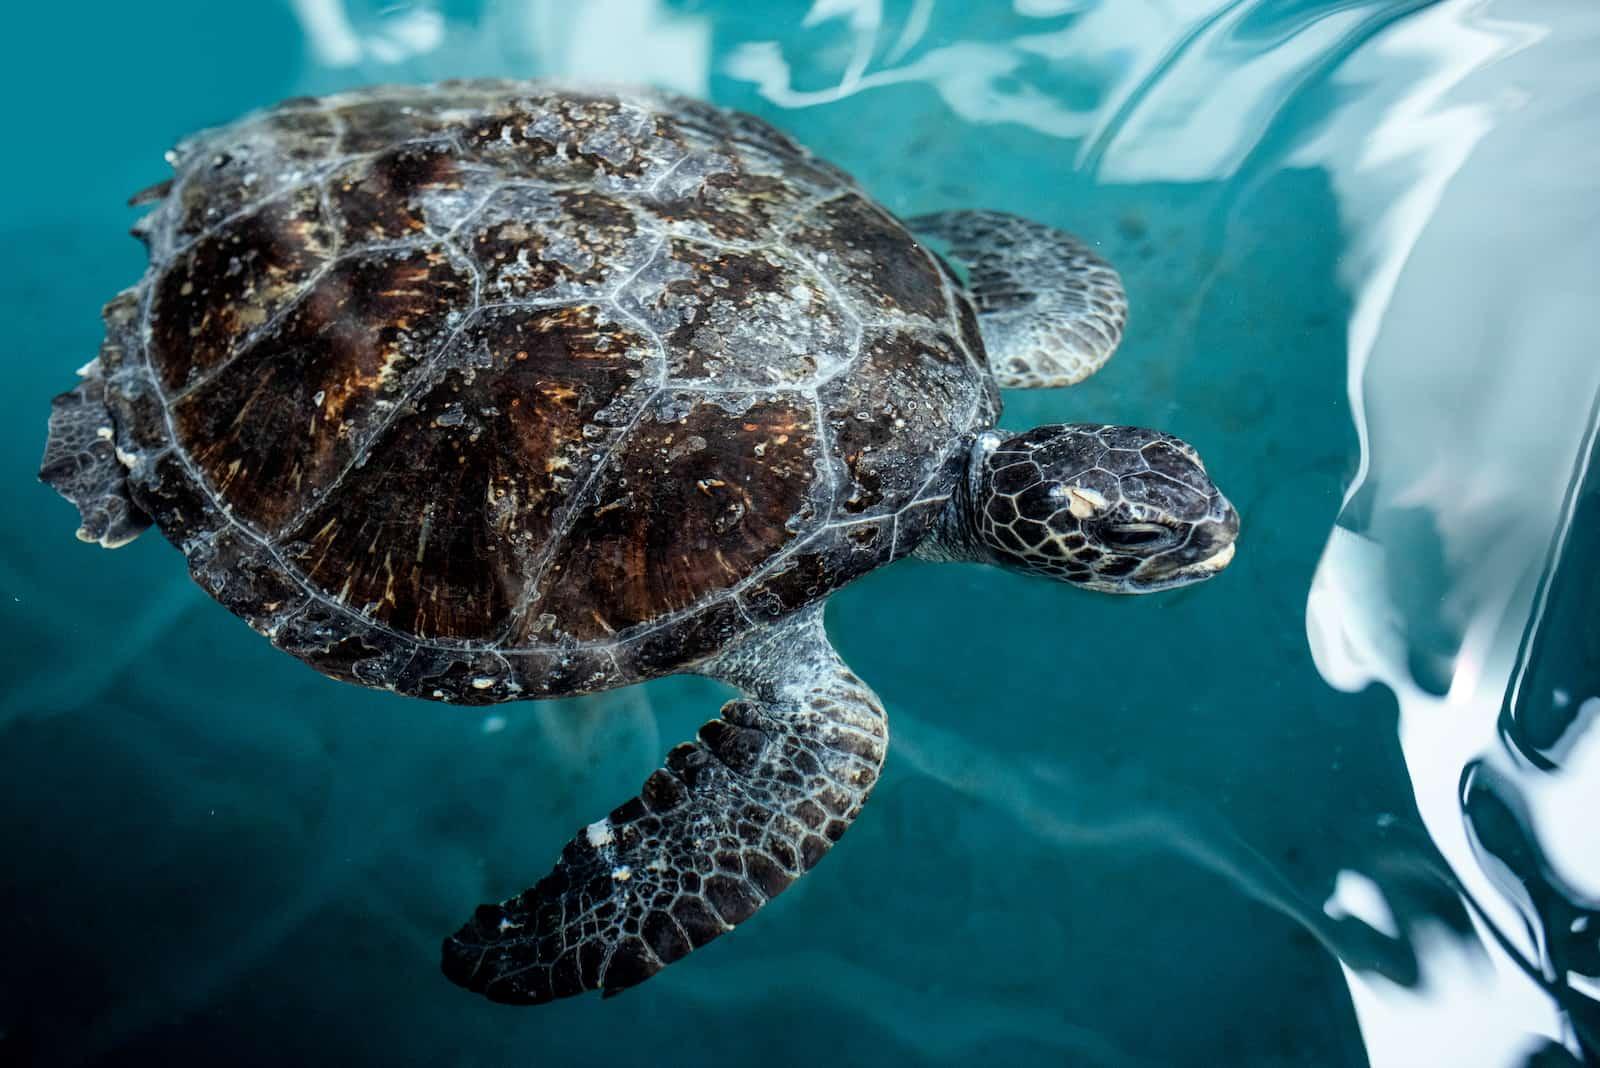 SEALIFE Sydney Animal Rescue